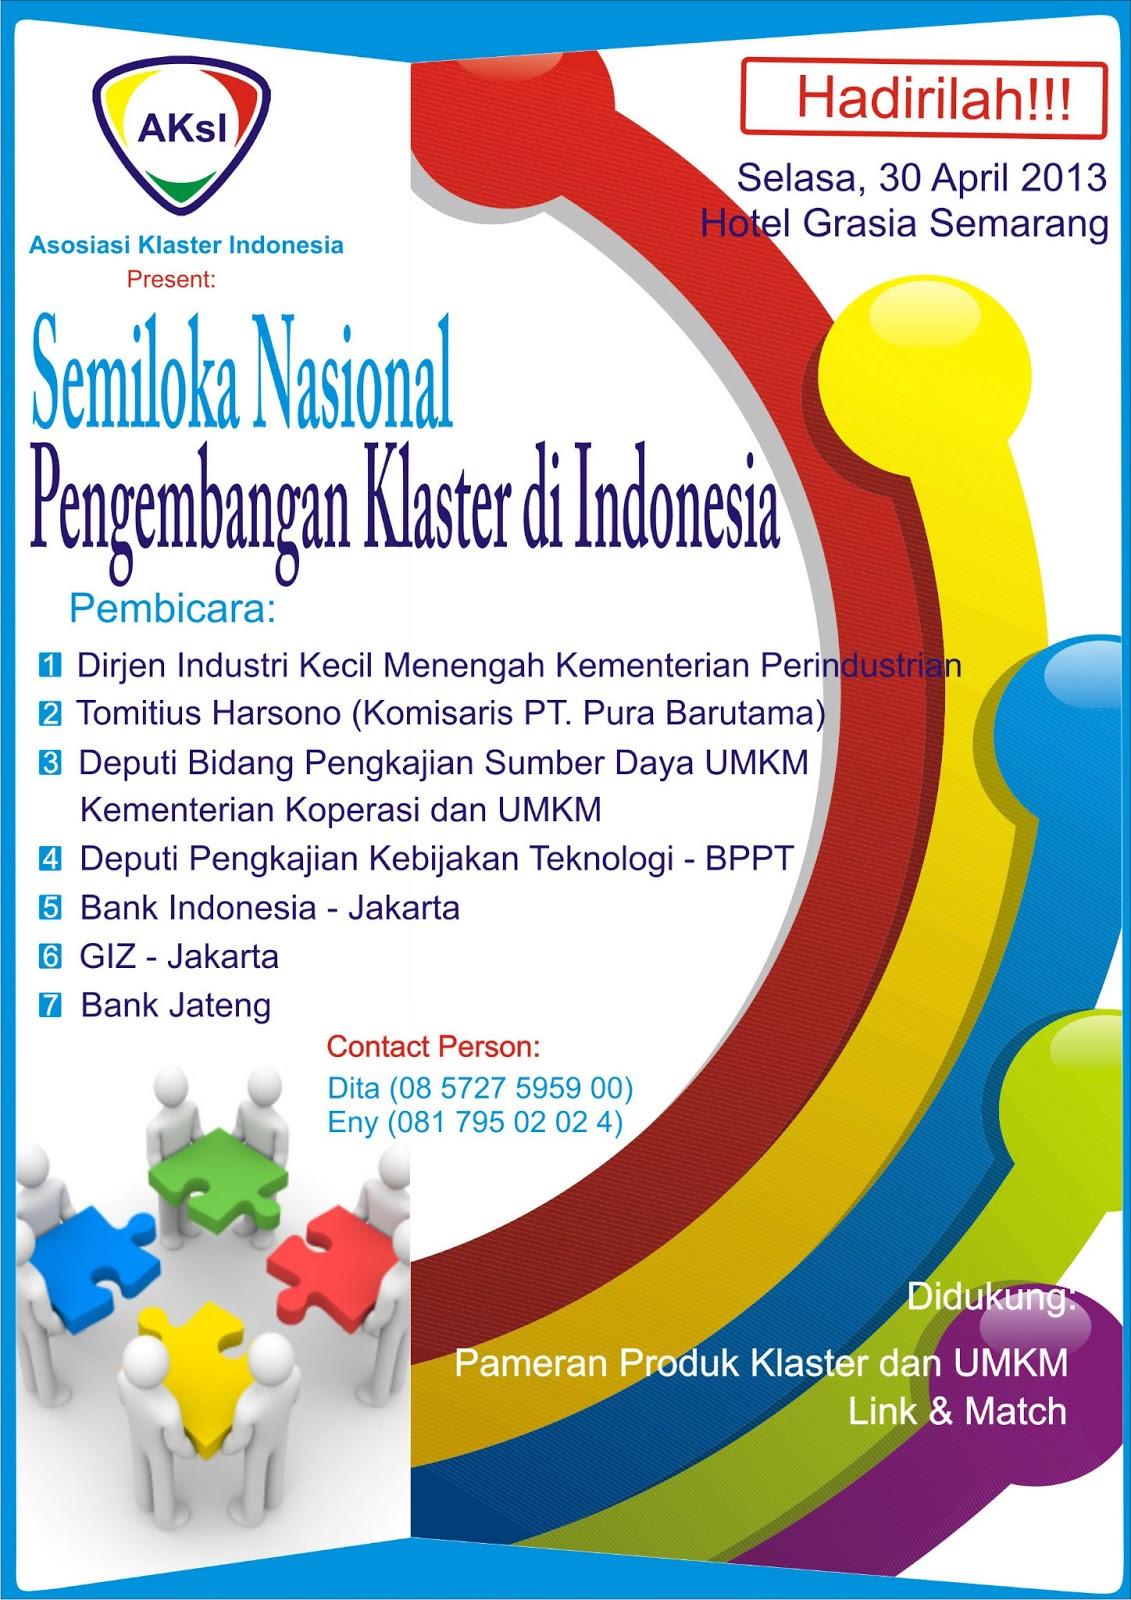 Klaster Umkm Produk Ukm Bumn Batik Parang Kembang Semiloka Nasional Pengembangan Di Indonesia